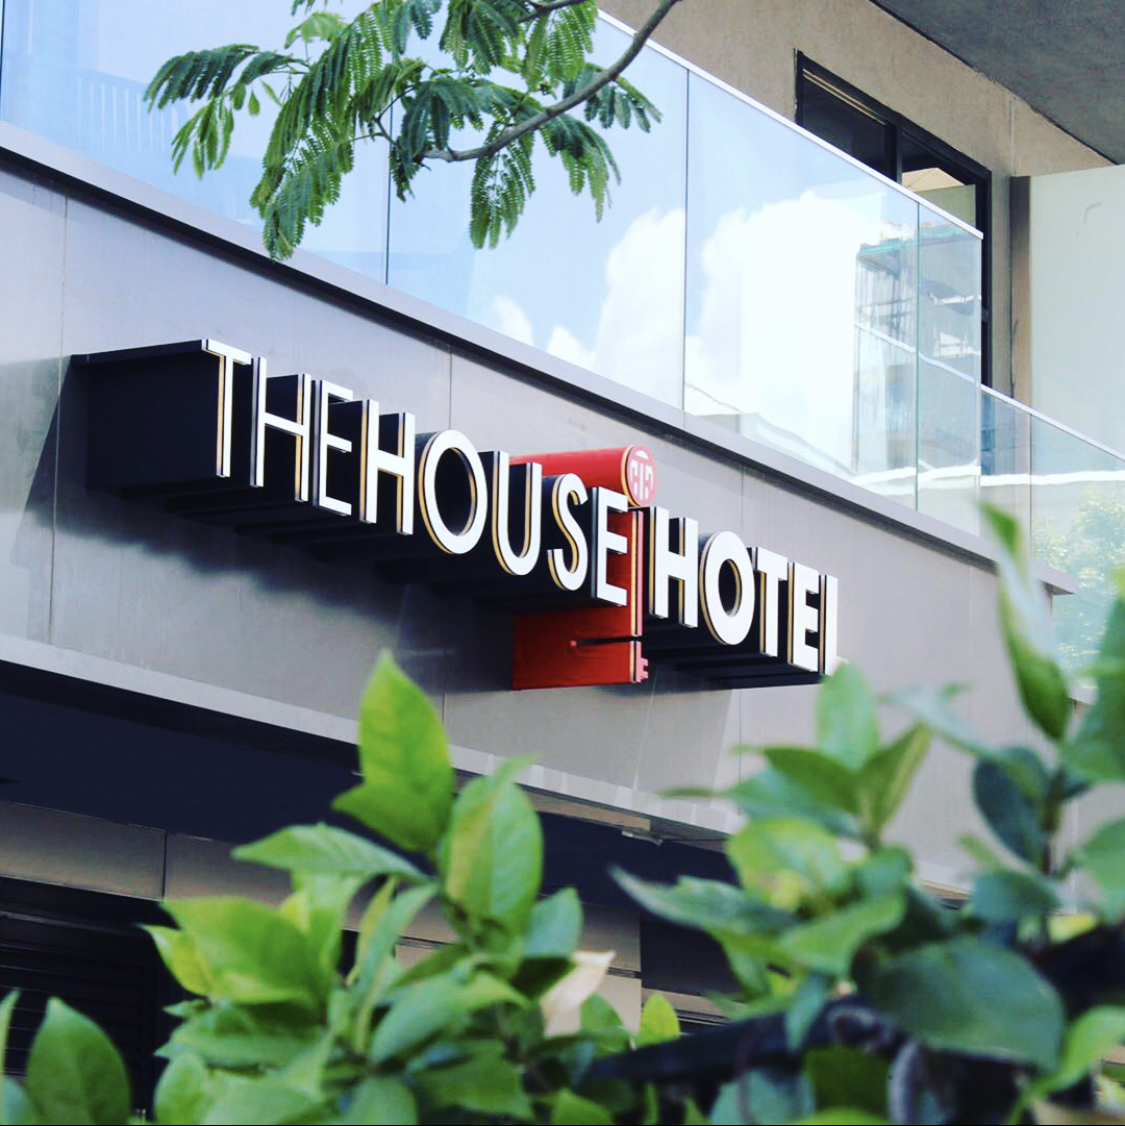 House hotel tabela yönlendirme